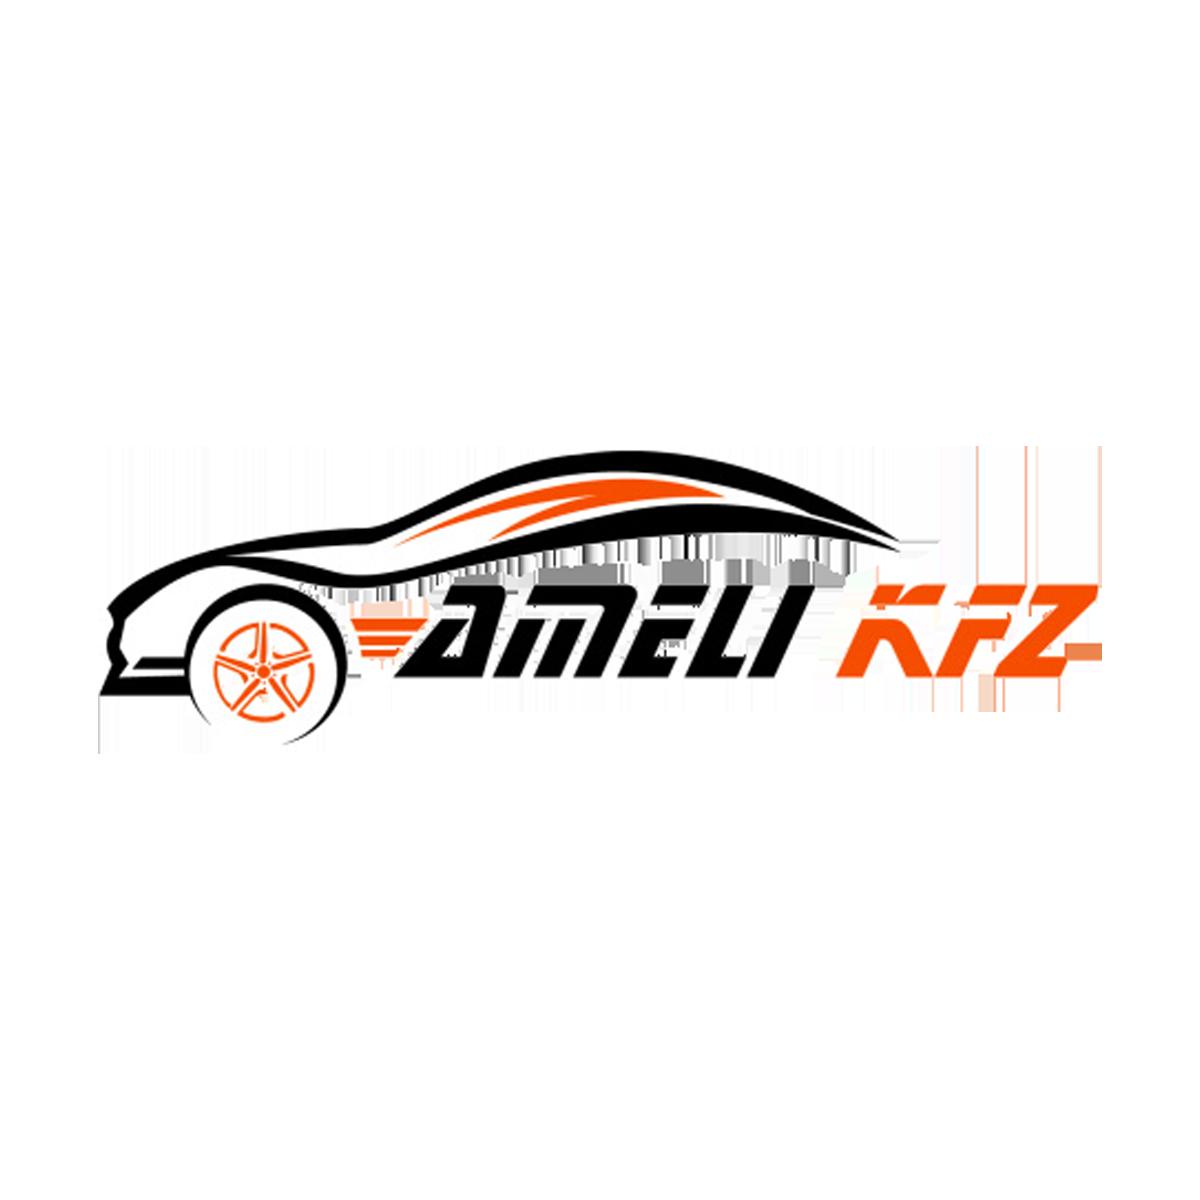 Ameli-KFZ